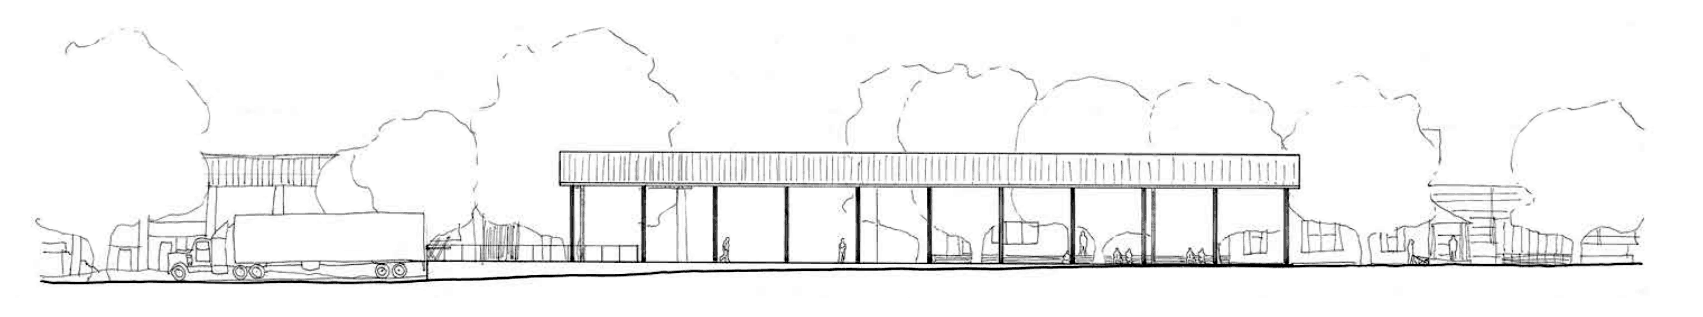 fabrication pavilion sketch